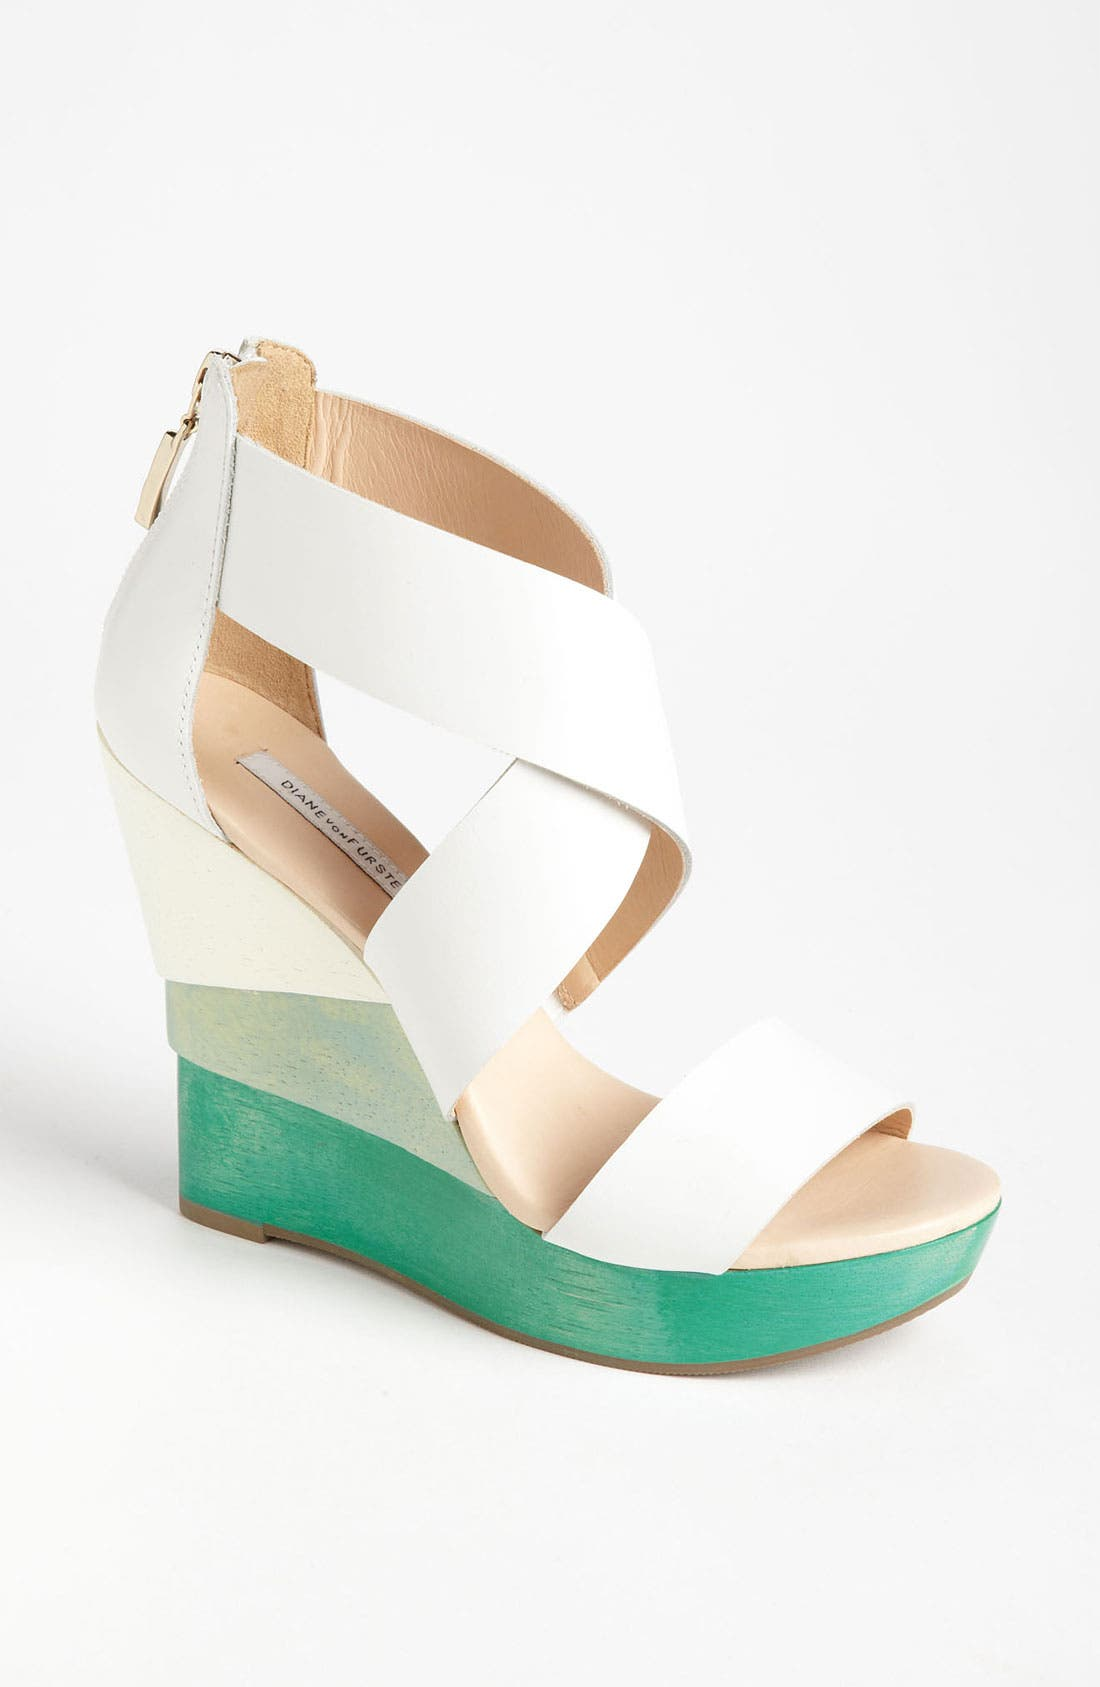 Main Image - Diane von Furstenberg 'Opal' Wedge Sandal